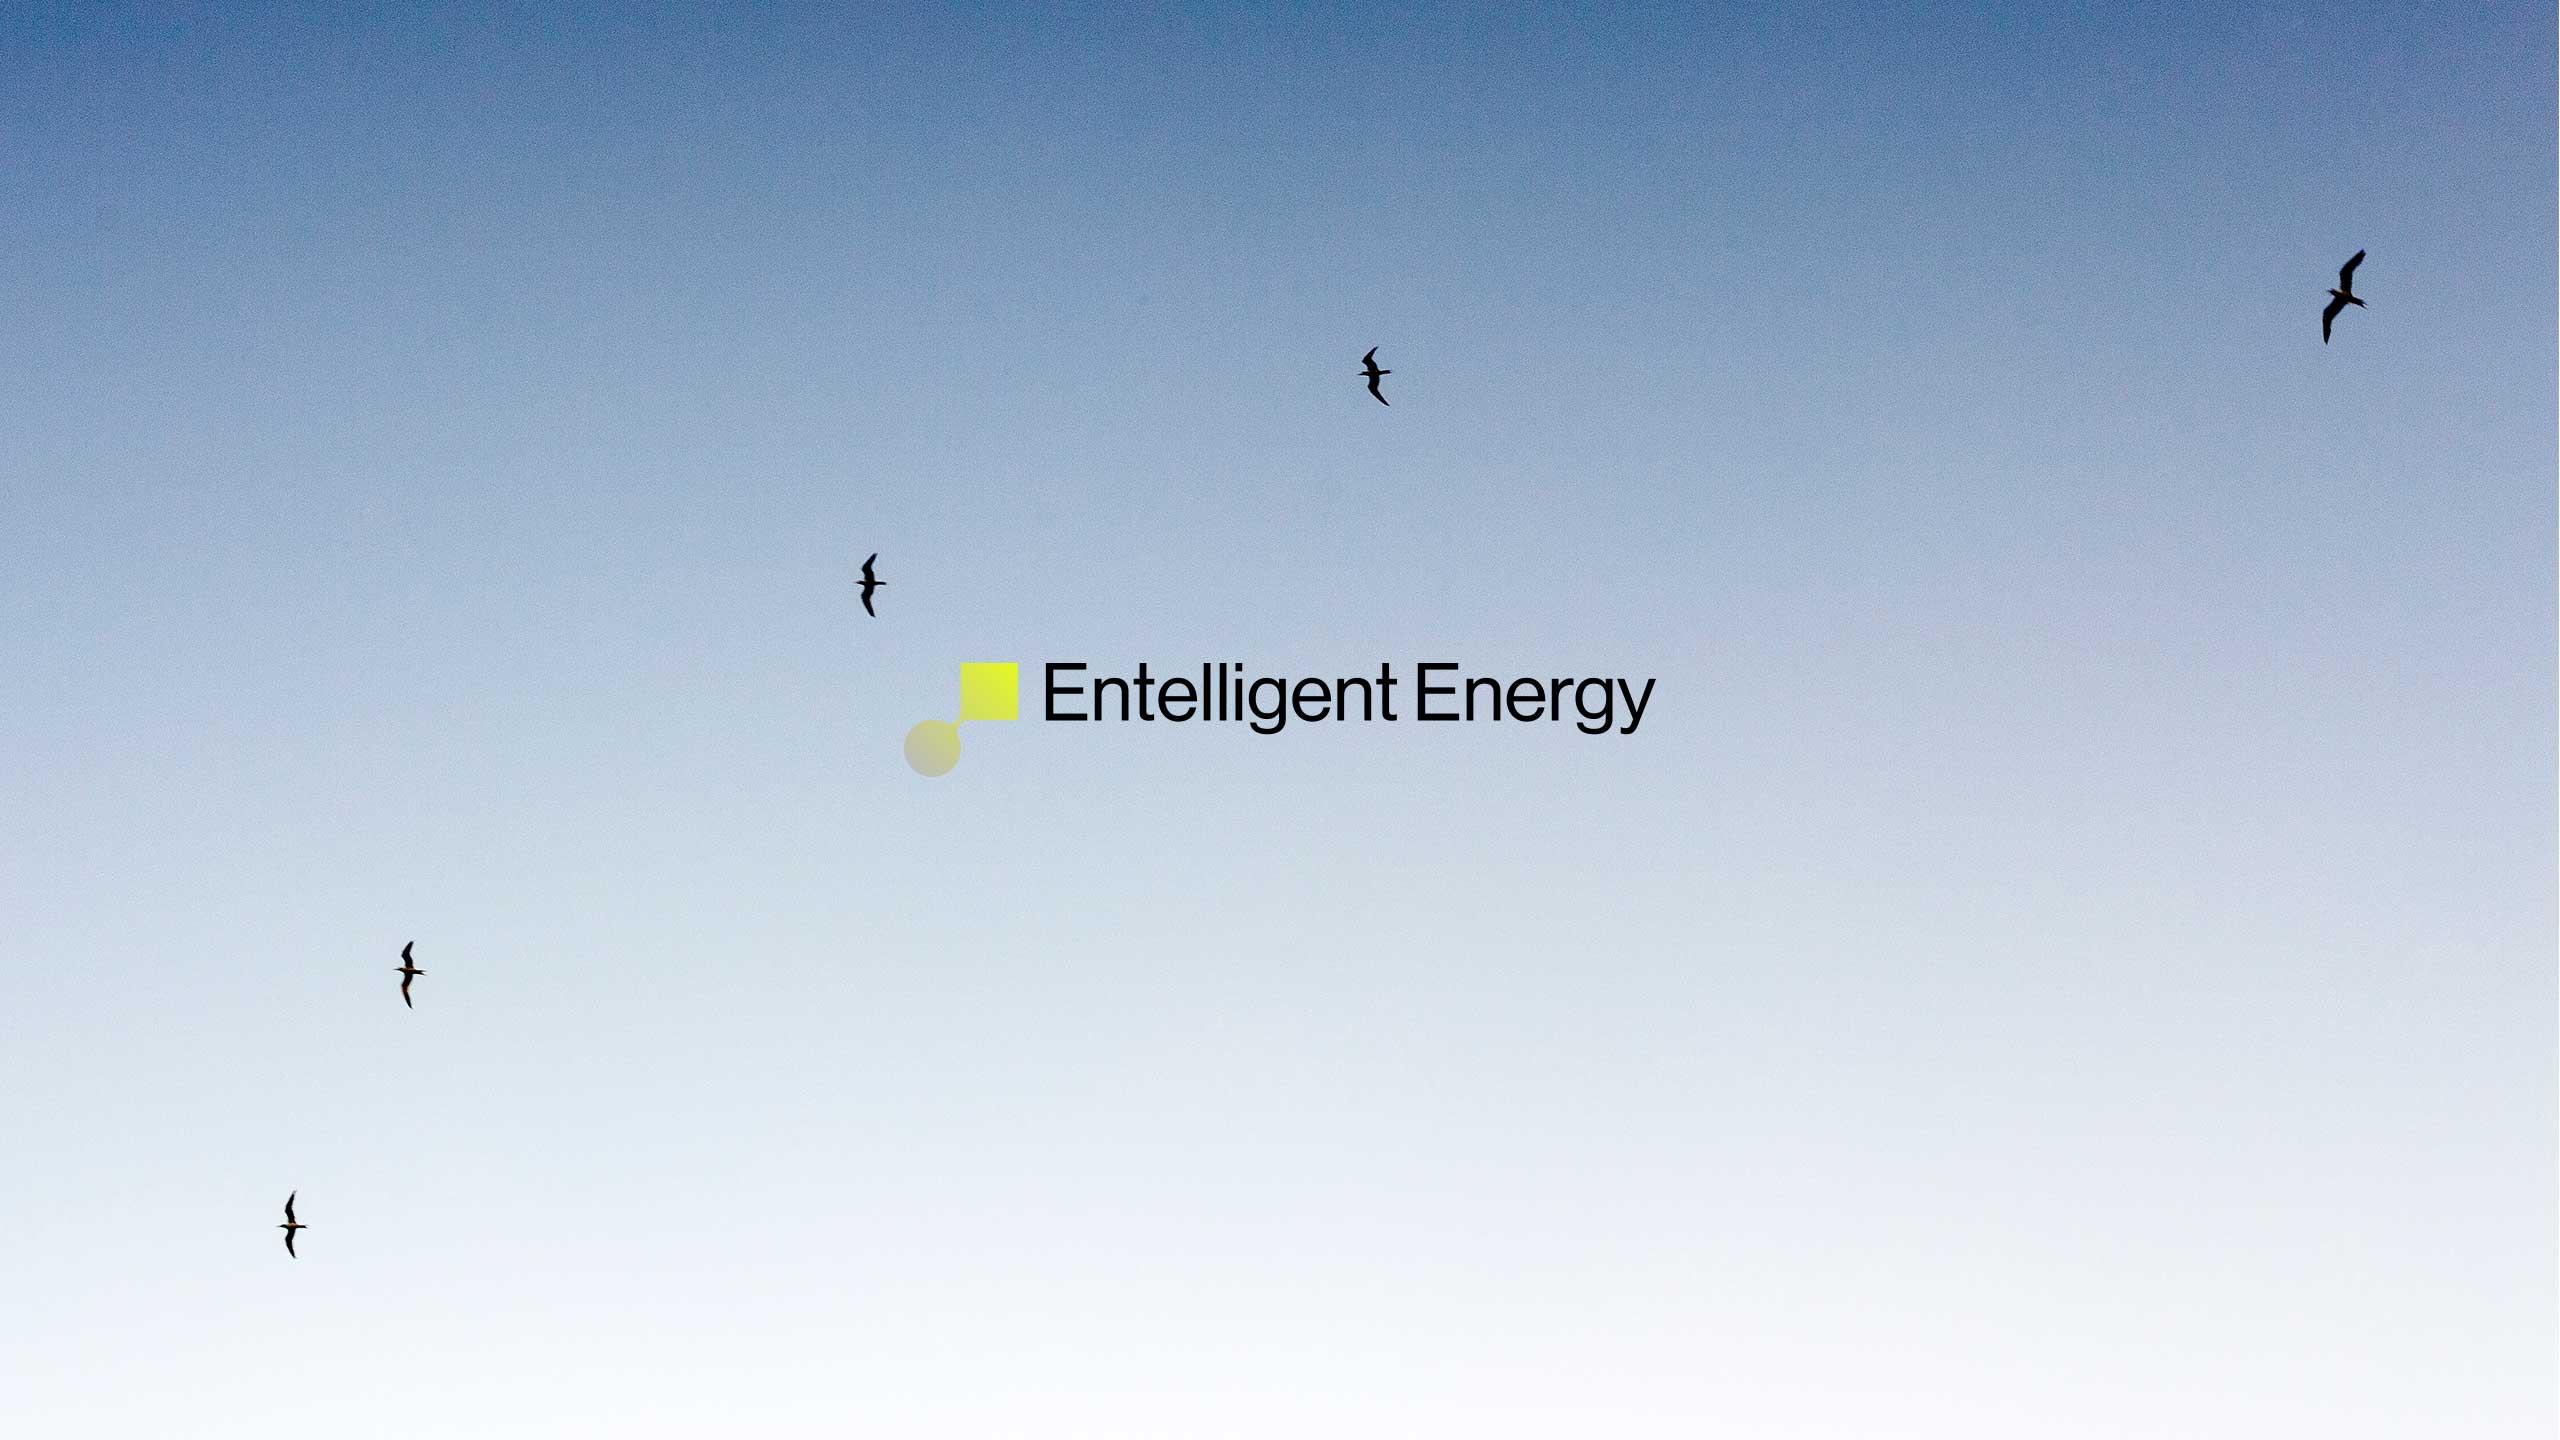 Entelligent-Energy-07